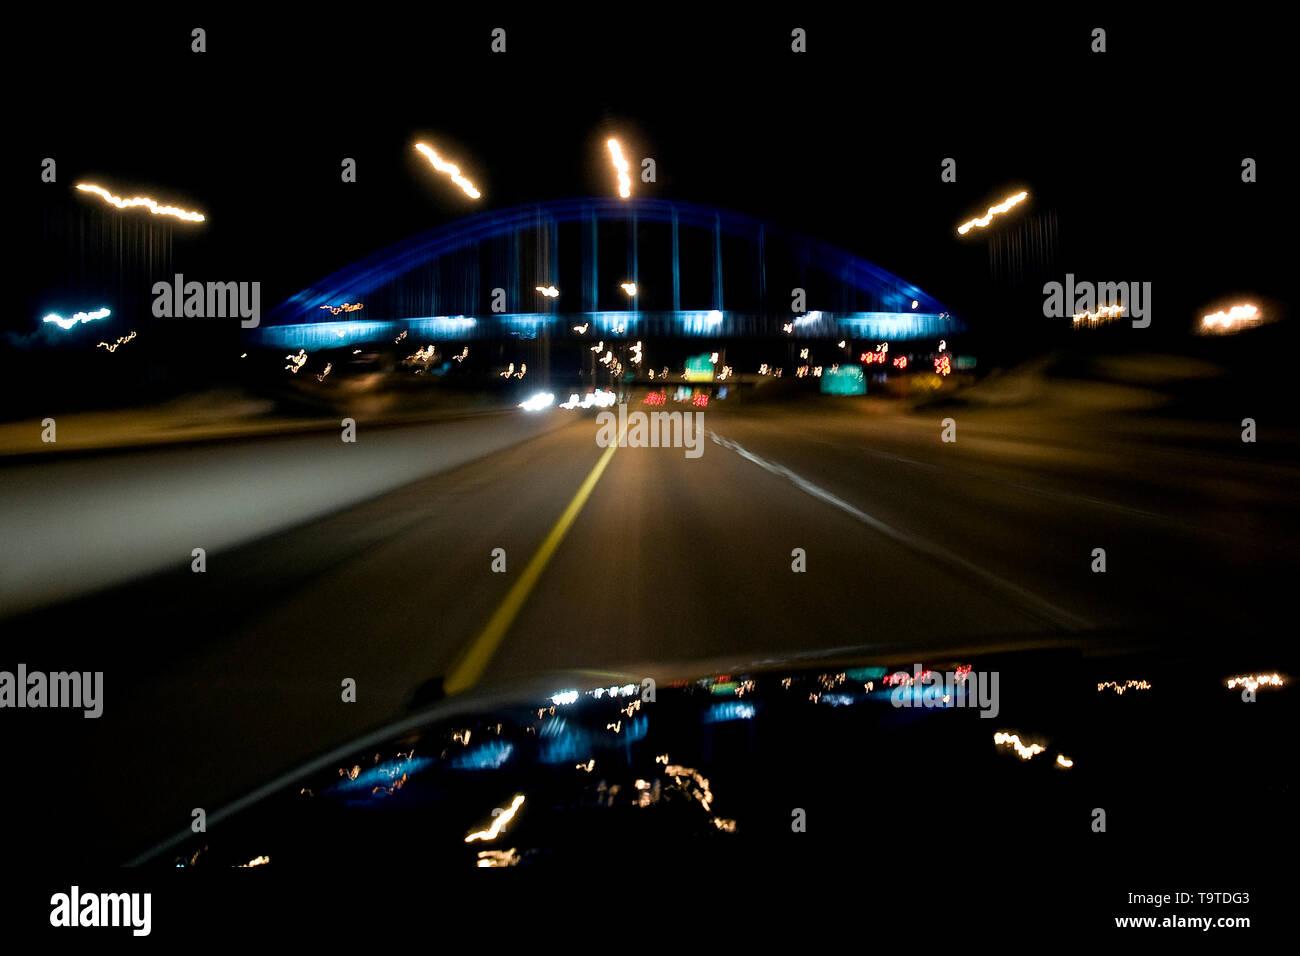 Motion blur image of I-235 bridge at night, Des Moines, Iowa - Stock Image